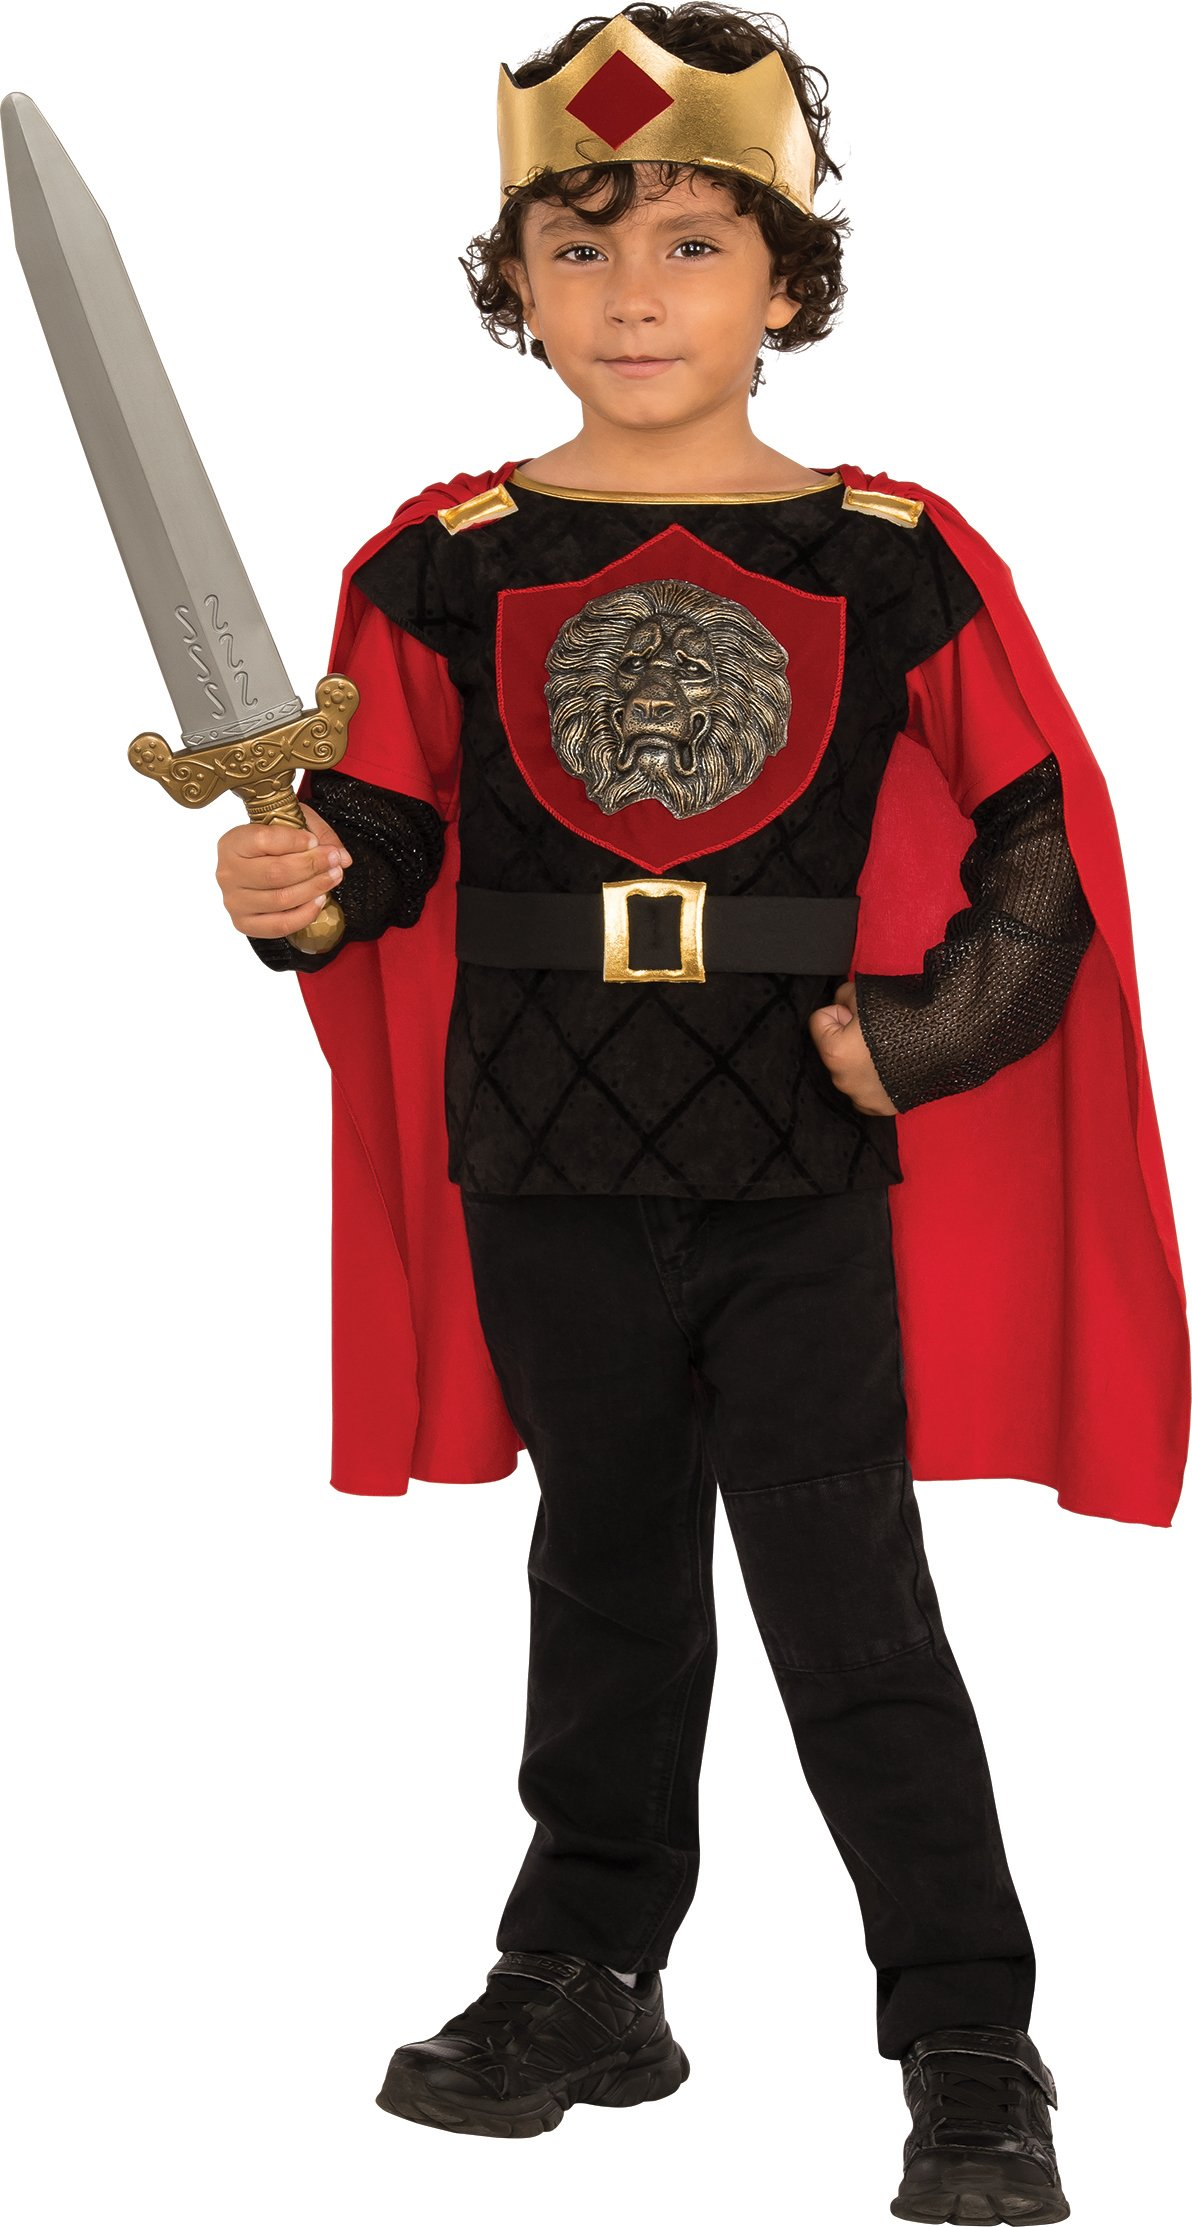 Rubies Costume Child's Little Knight Costume, Medium, Multicolor